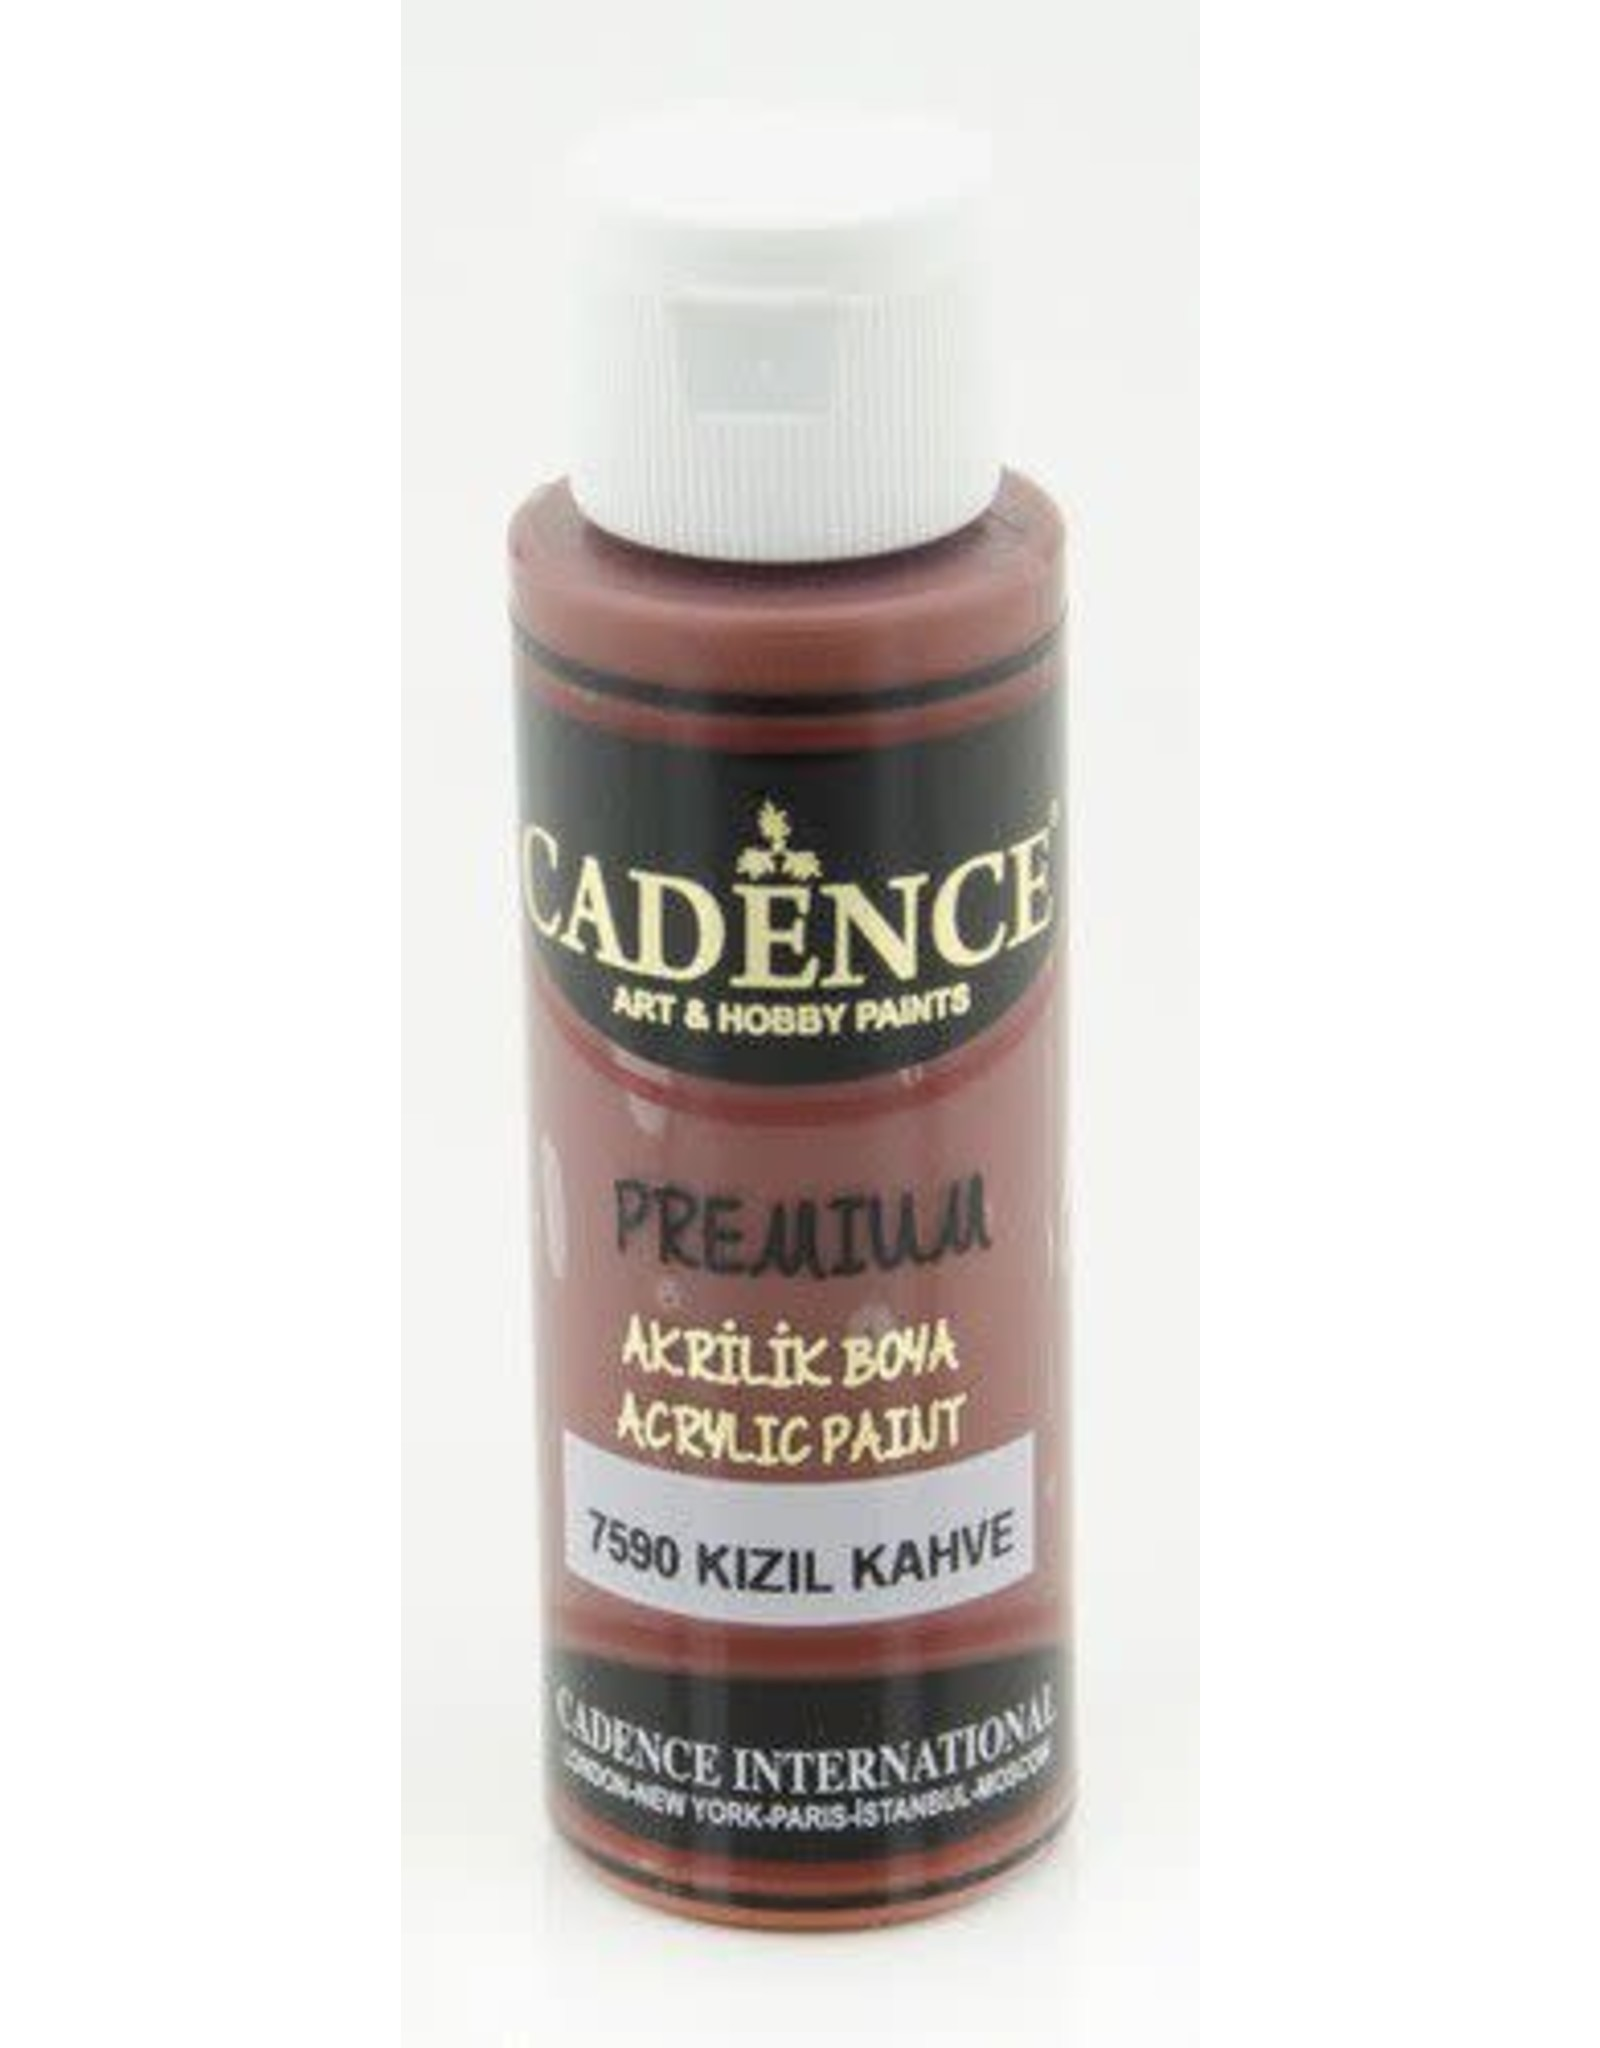 Cadence Cadence Premium acrylverf (semi mat) Roodbruin